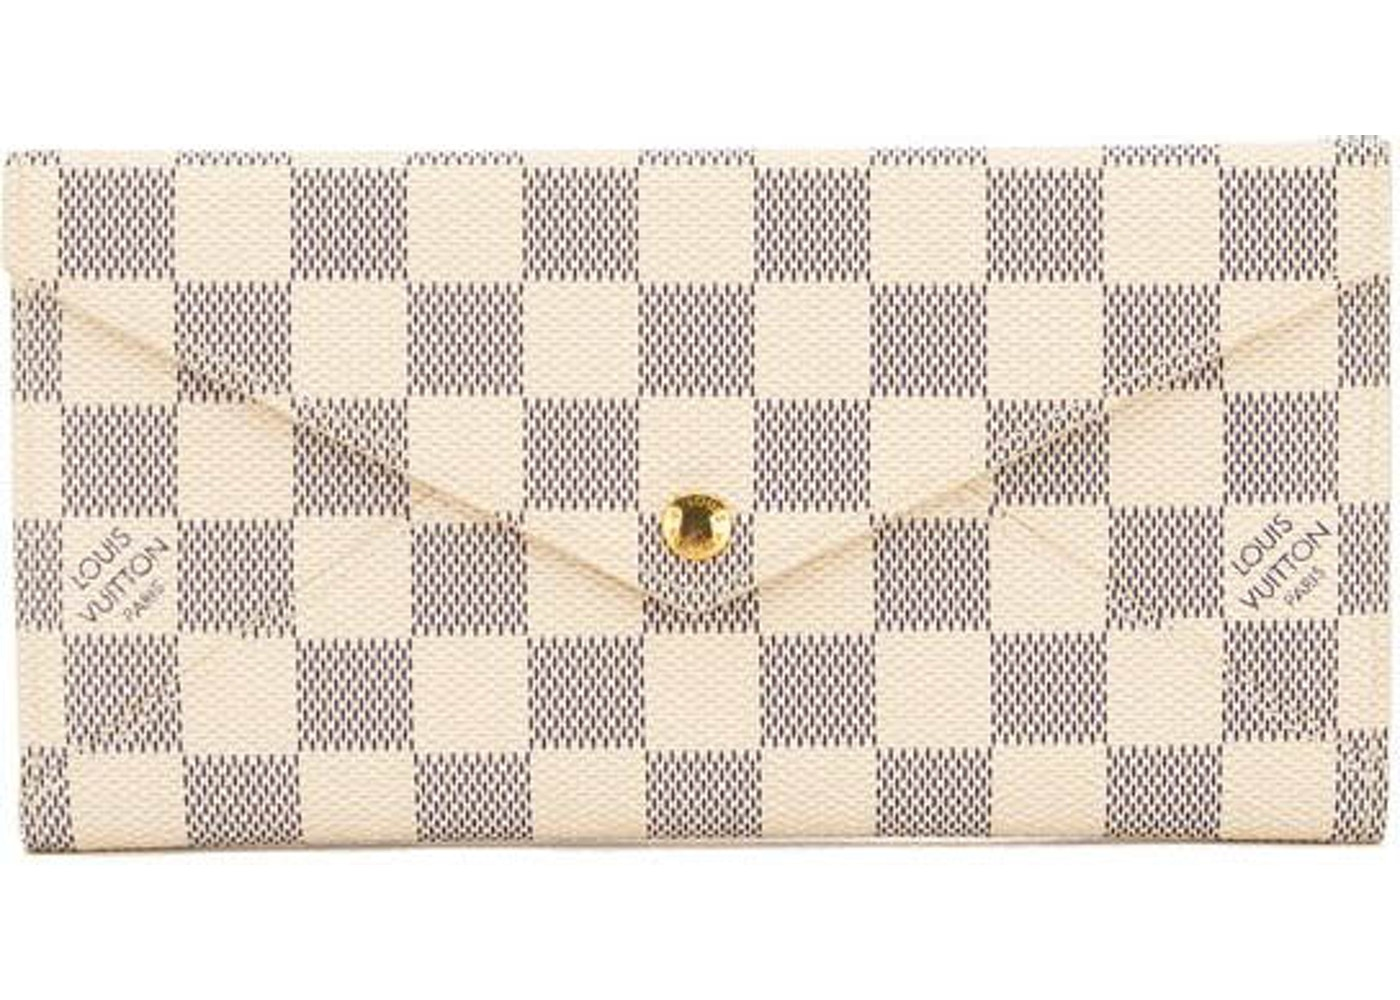 Louis Vuitton Origami Long Wallet Damier Azur Bluewhite